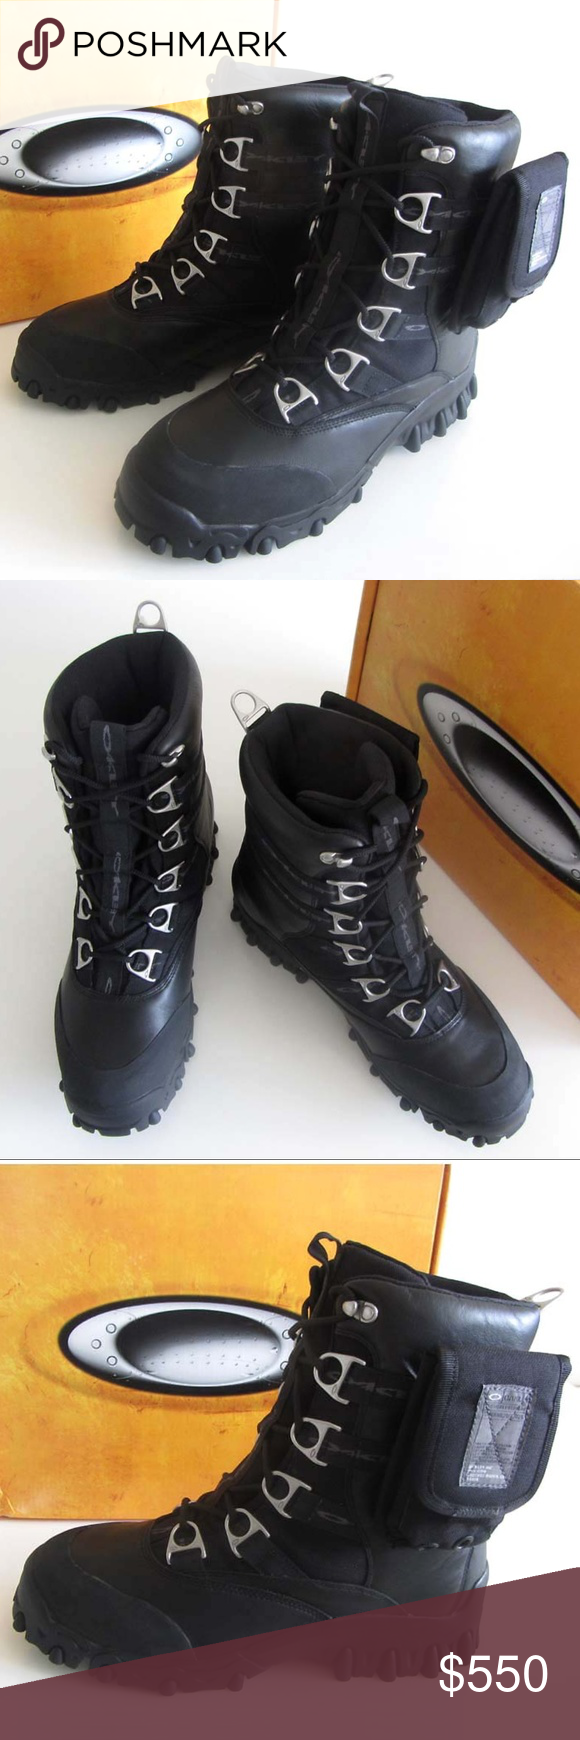 15bb2c1e883 Oakley Shoes | New Oakley Thermolite Waterproof Hiking Boots 12 ...